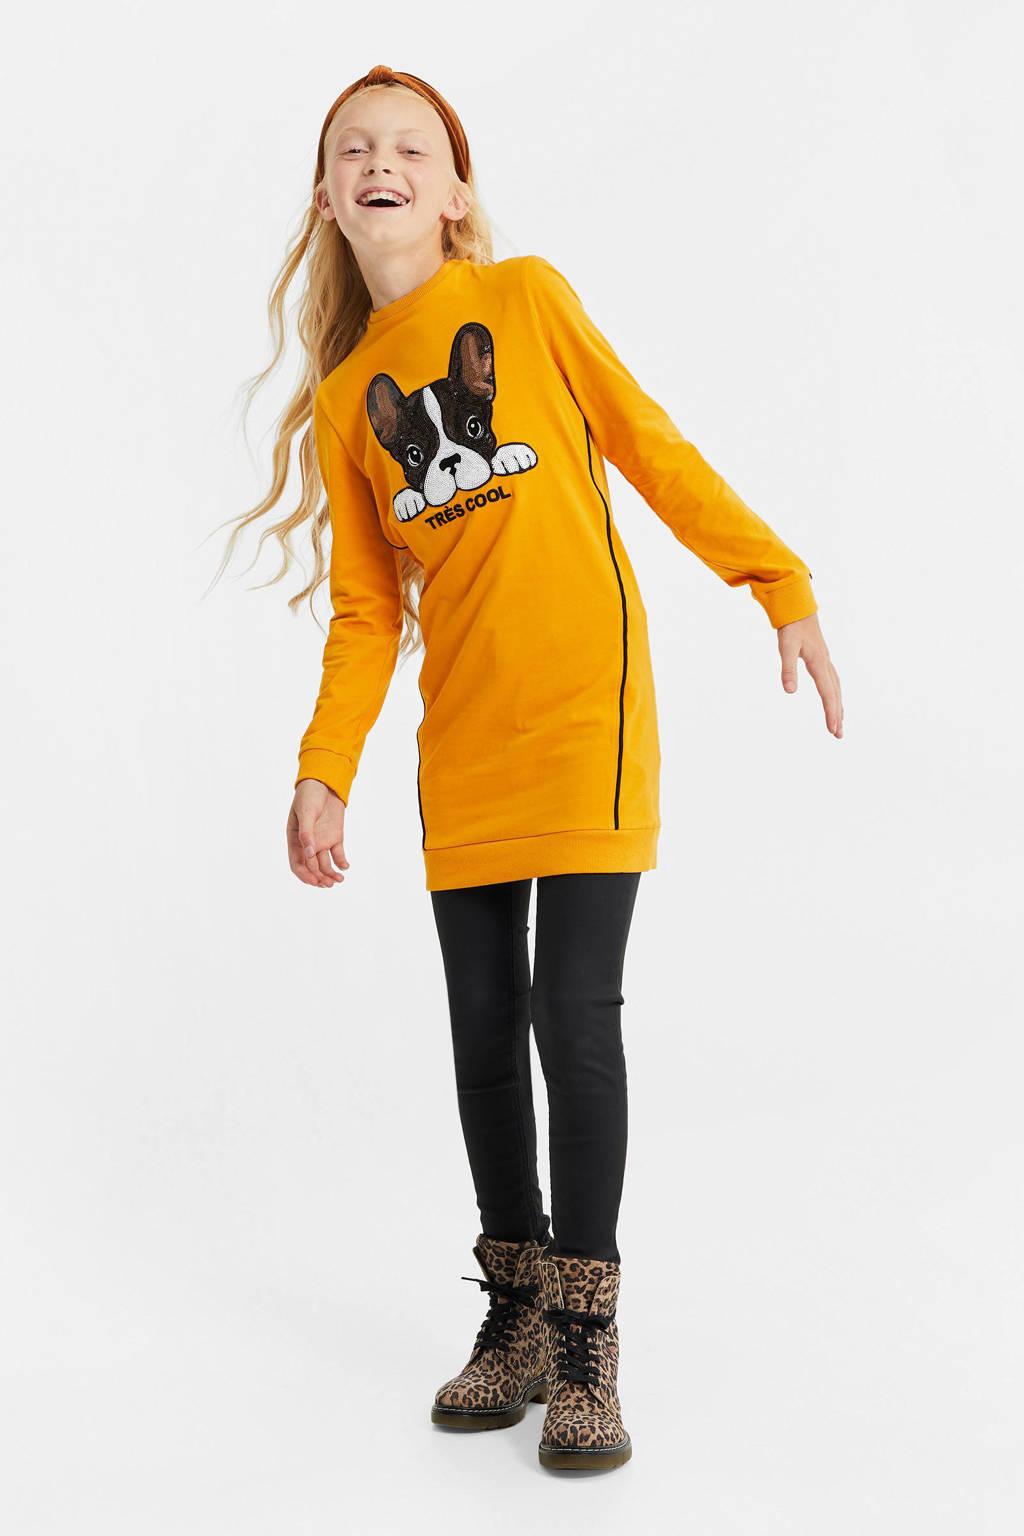 WE Fashion sweatjurk met printopdruk geel/zwart/wit, Geel/zwart/wit